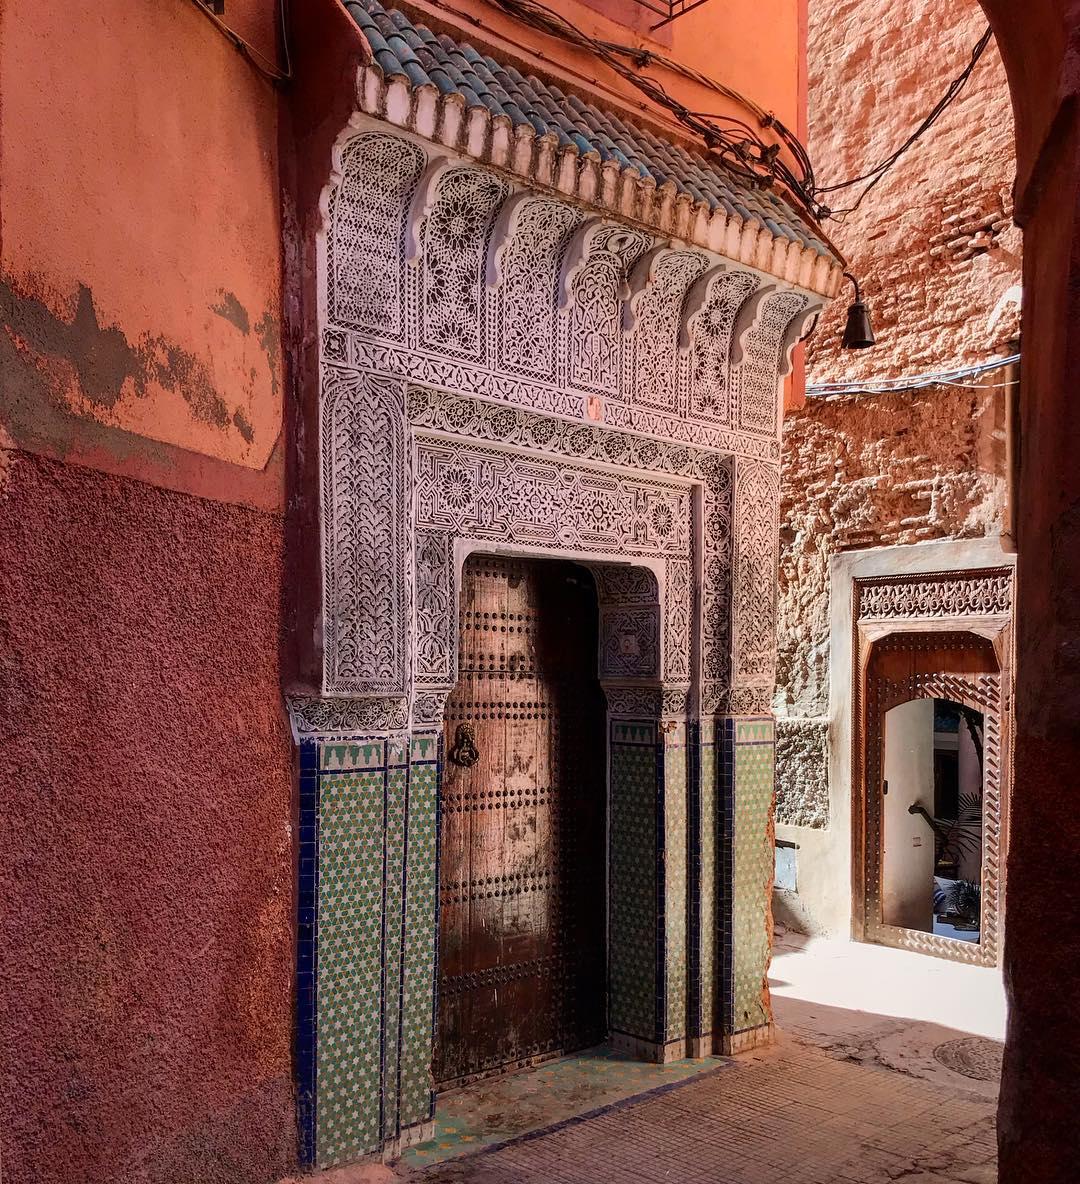 Top Reasons to Visit Marrakech: Medina of Marrakech